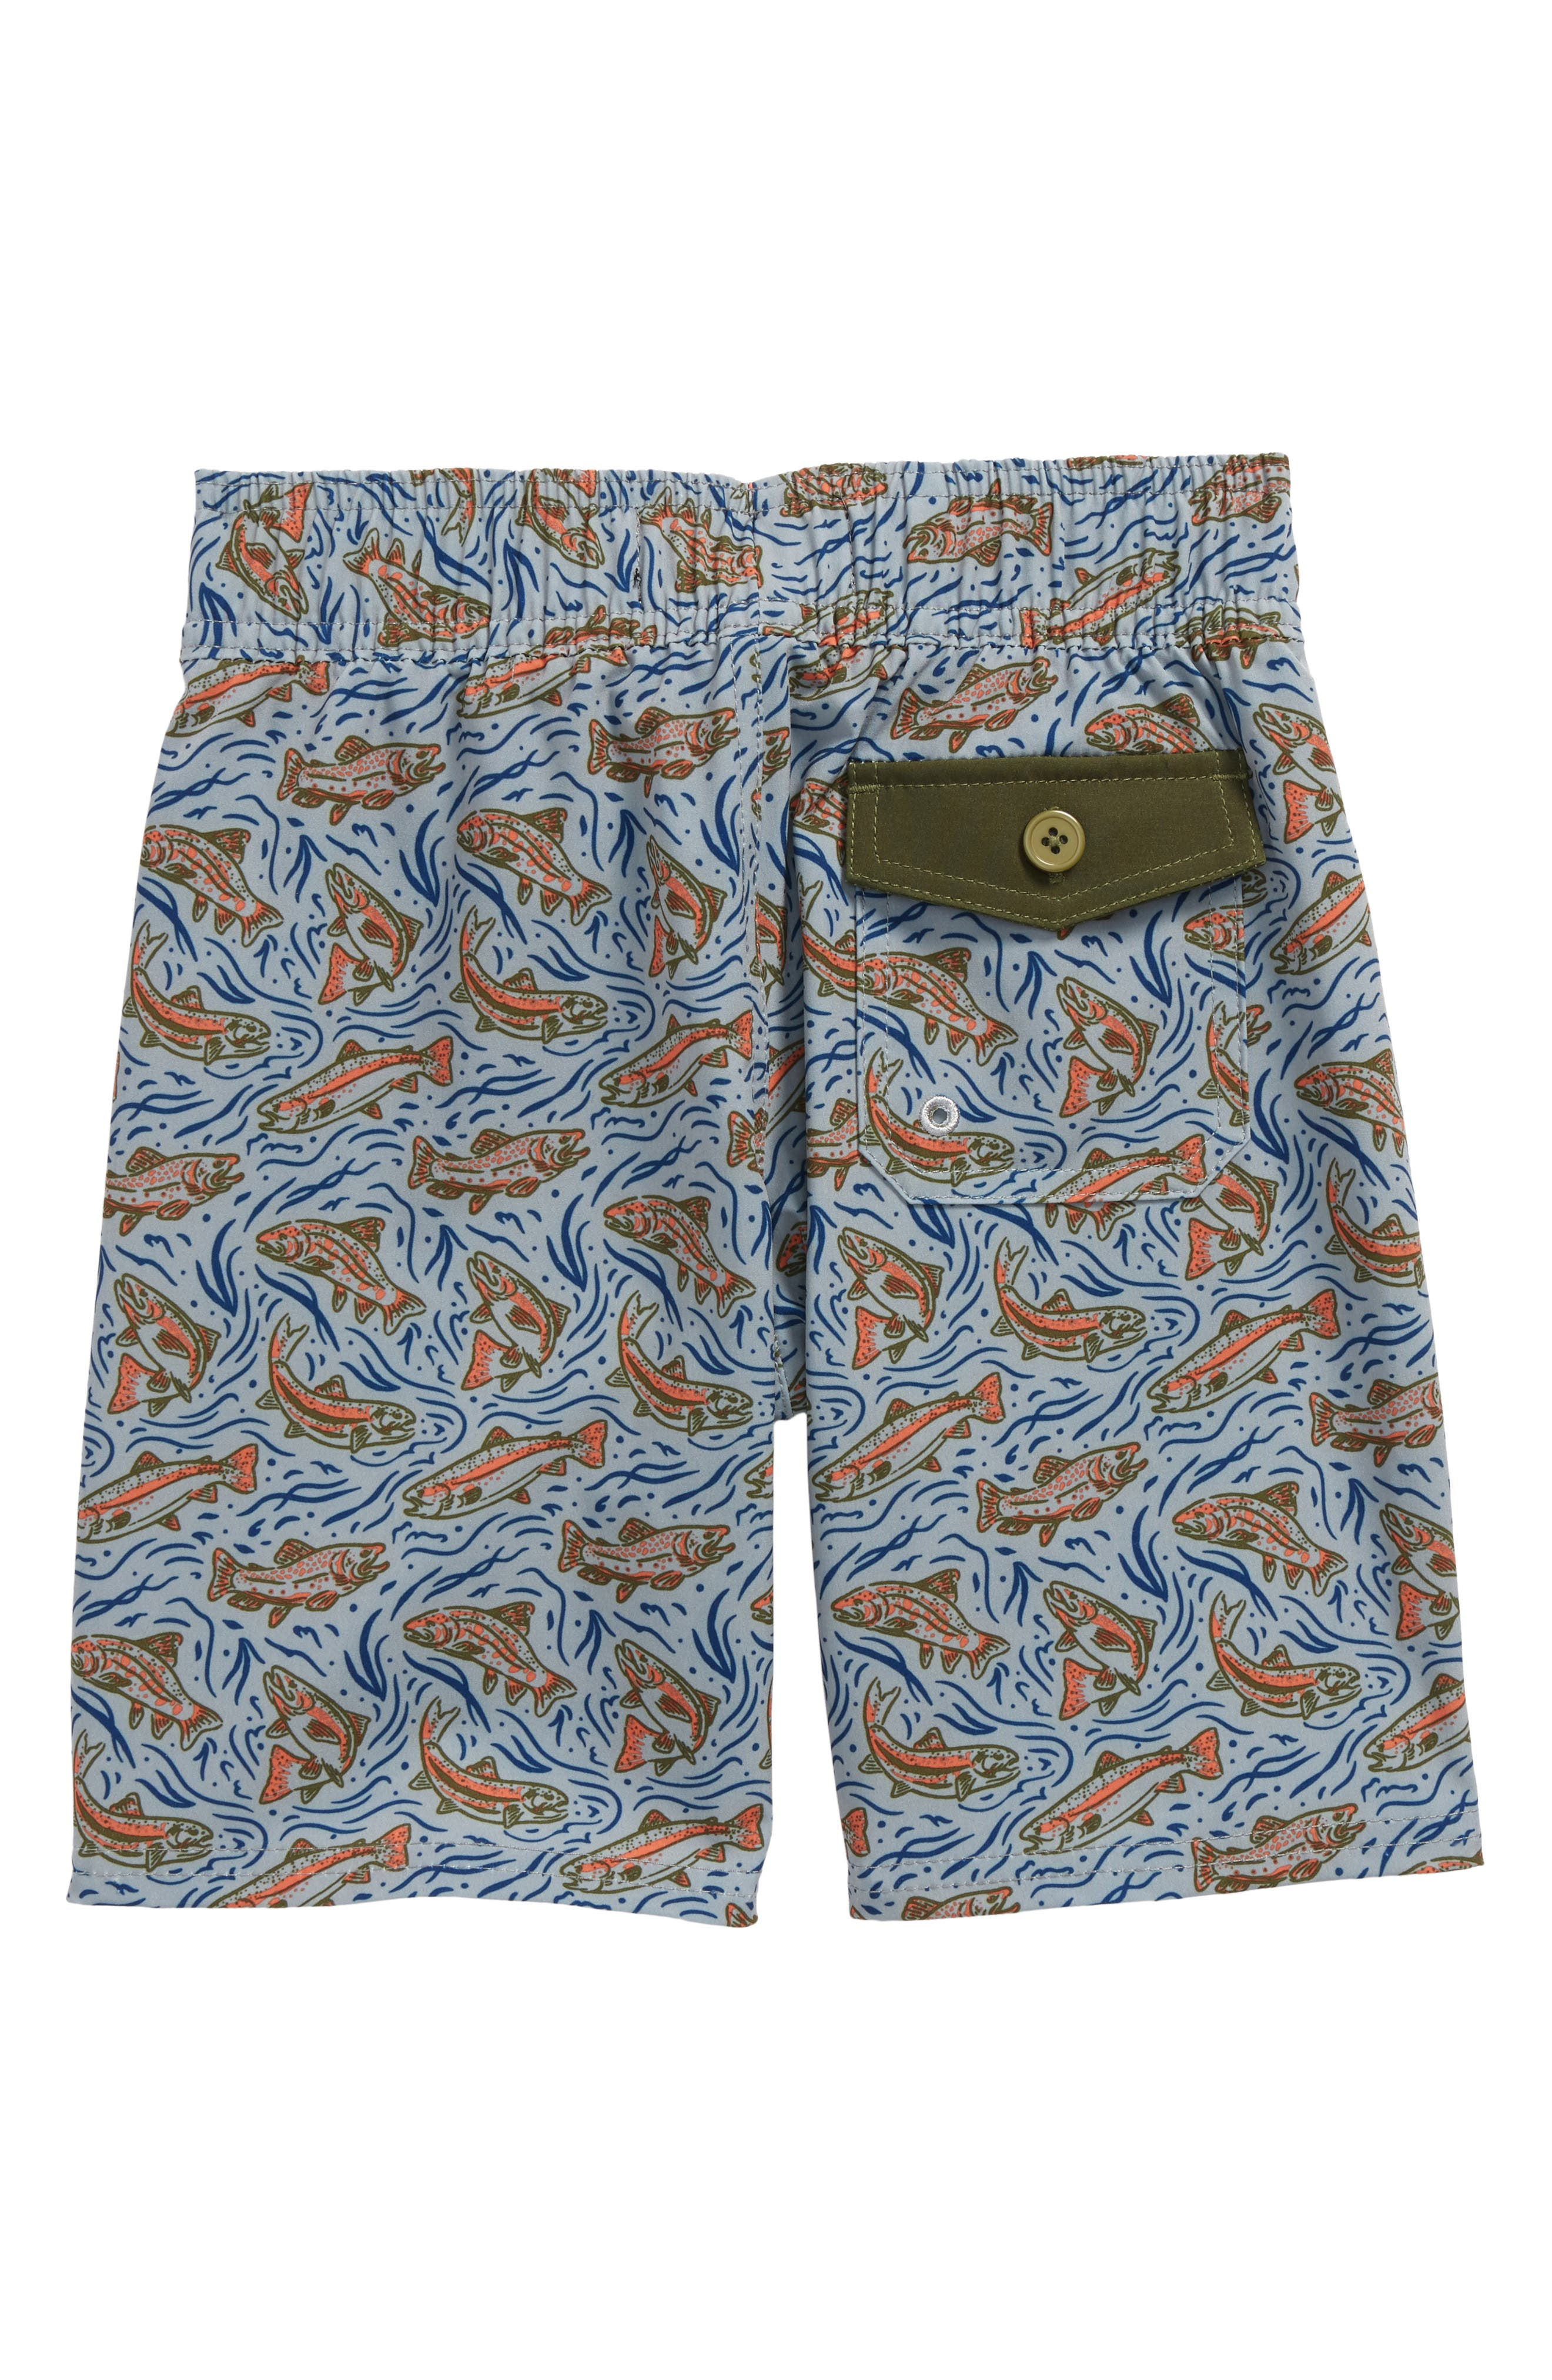 Upstream Board Shorts,                             Alternate thumbnail 2, color,                             020